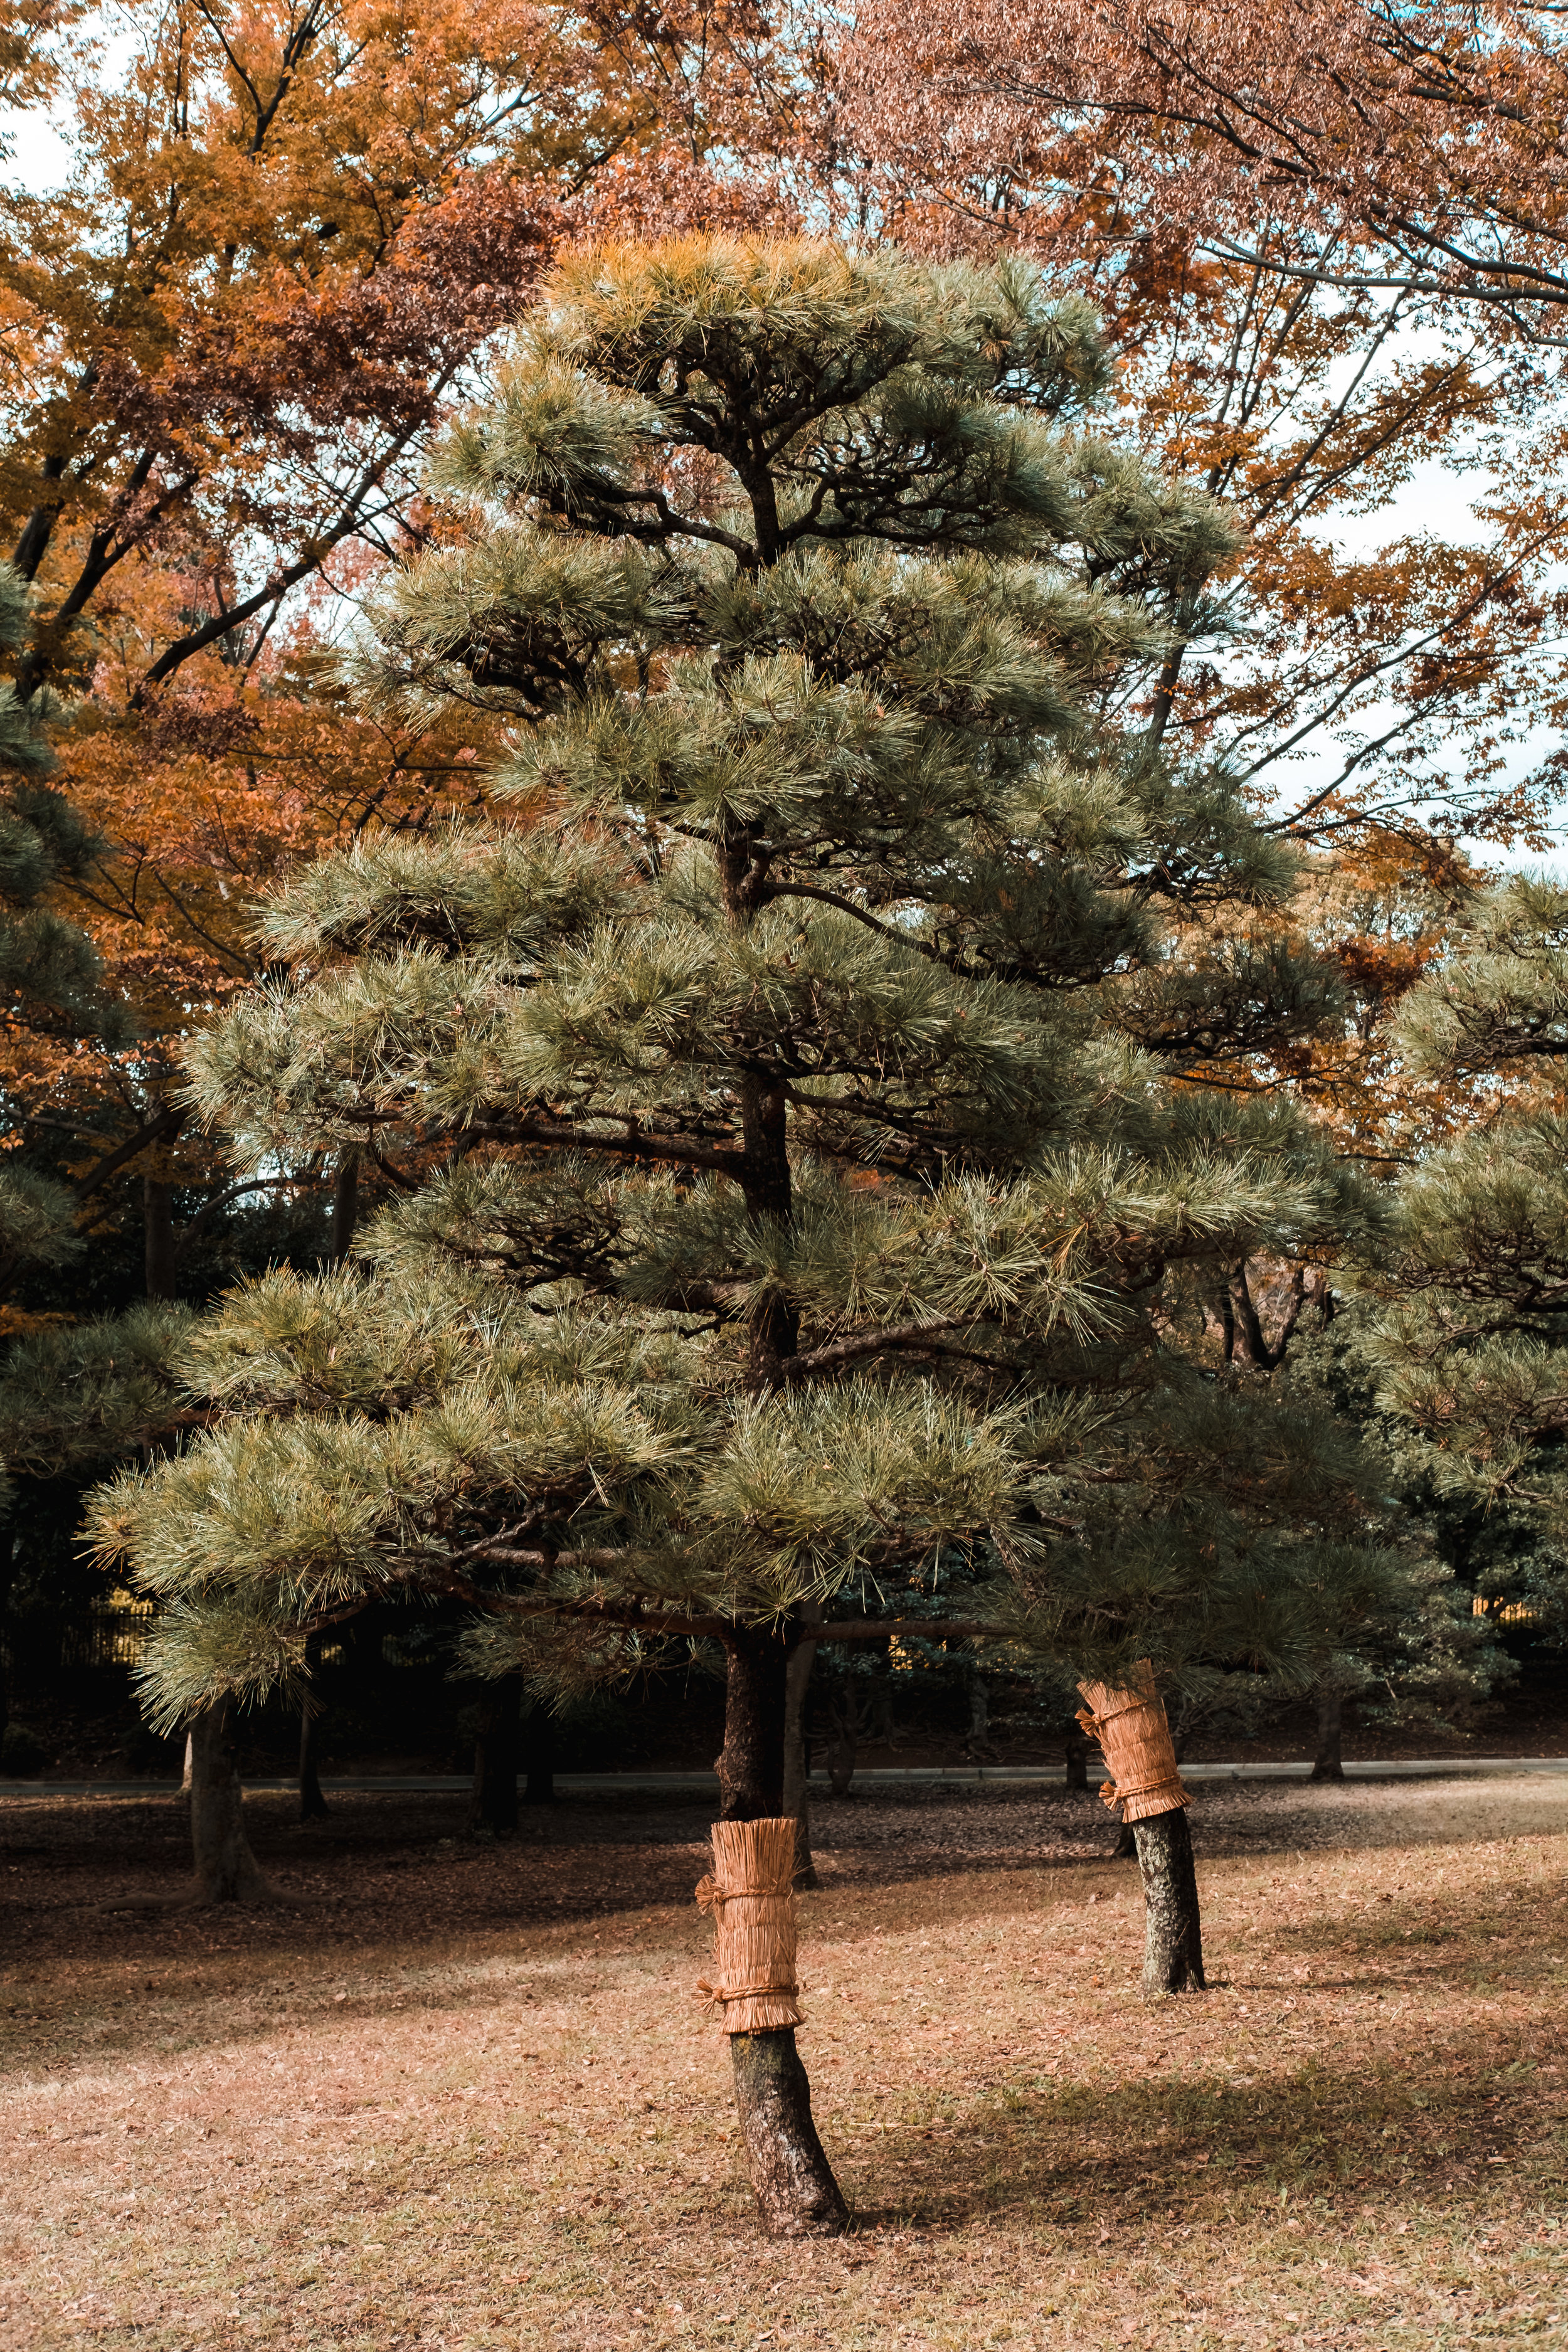 Tokyo_Nov_2018_AdamDillon_DSCF1138.jpg